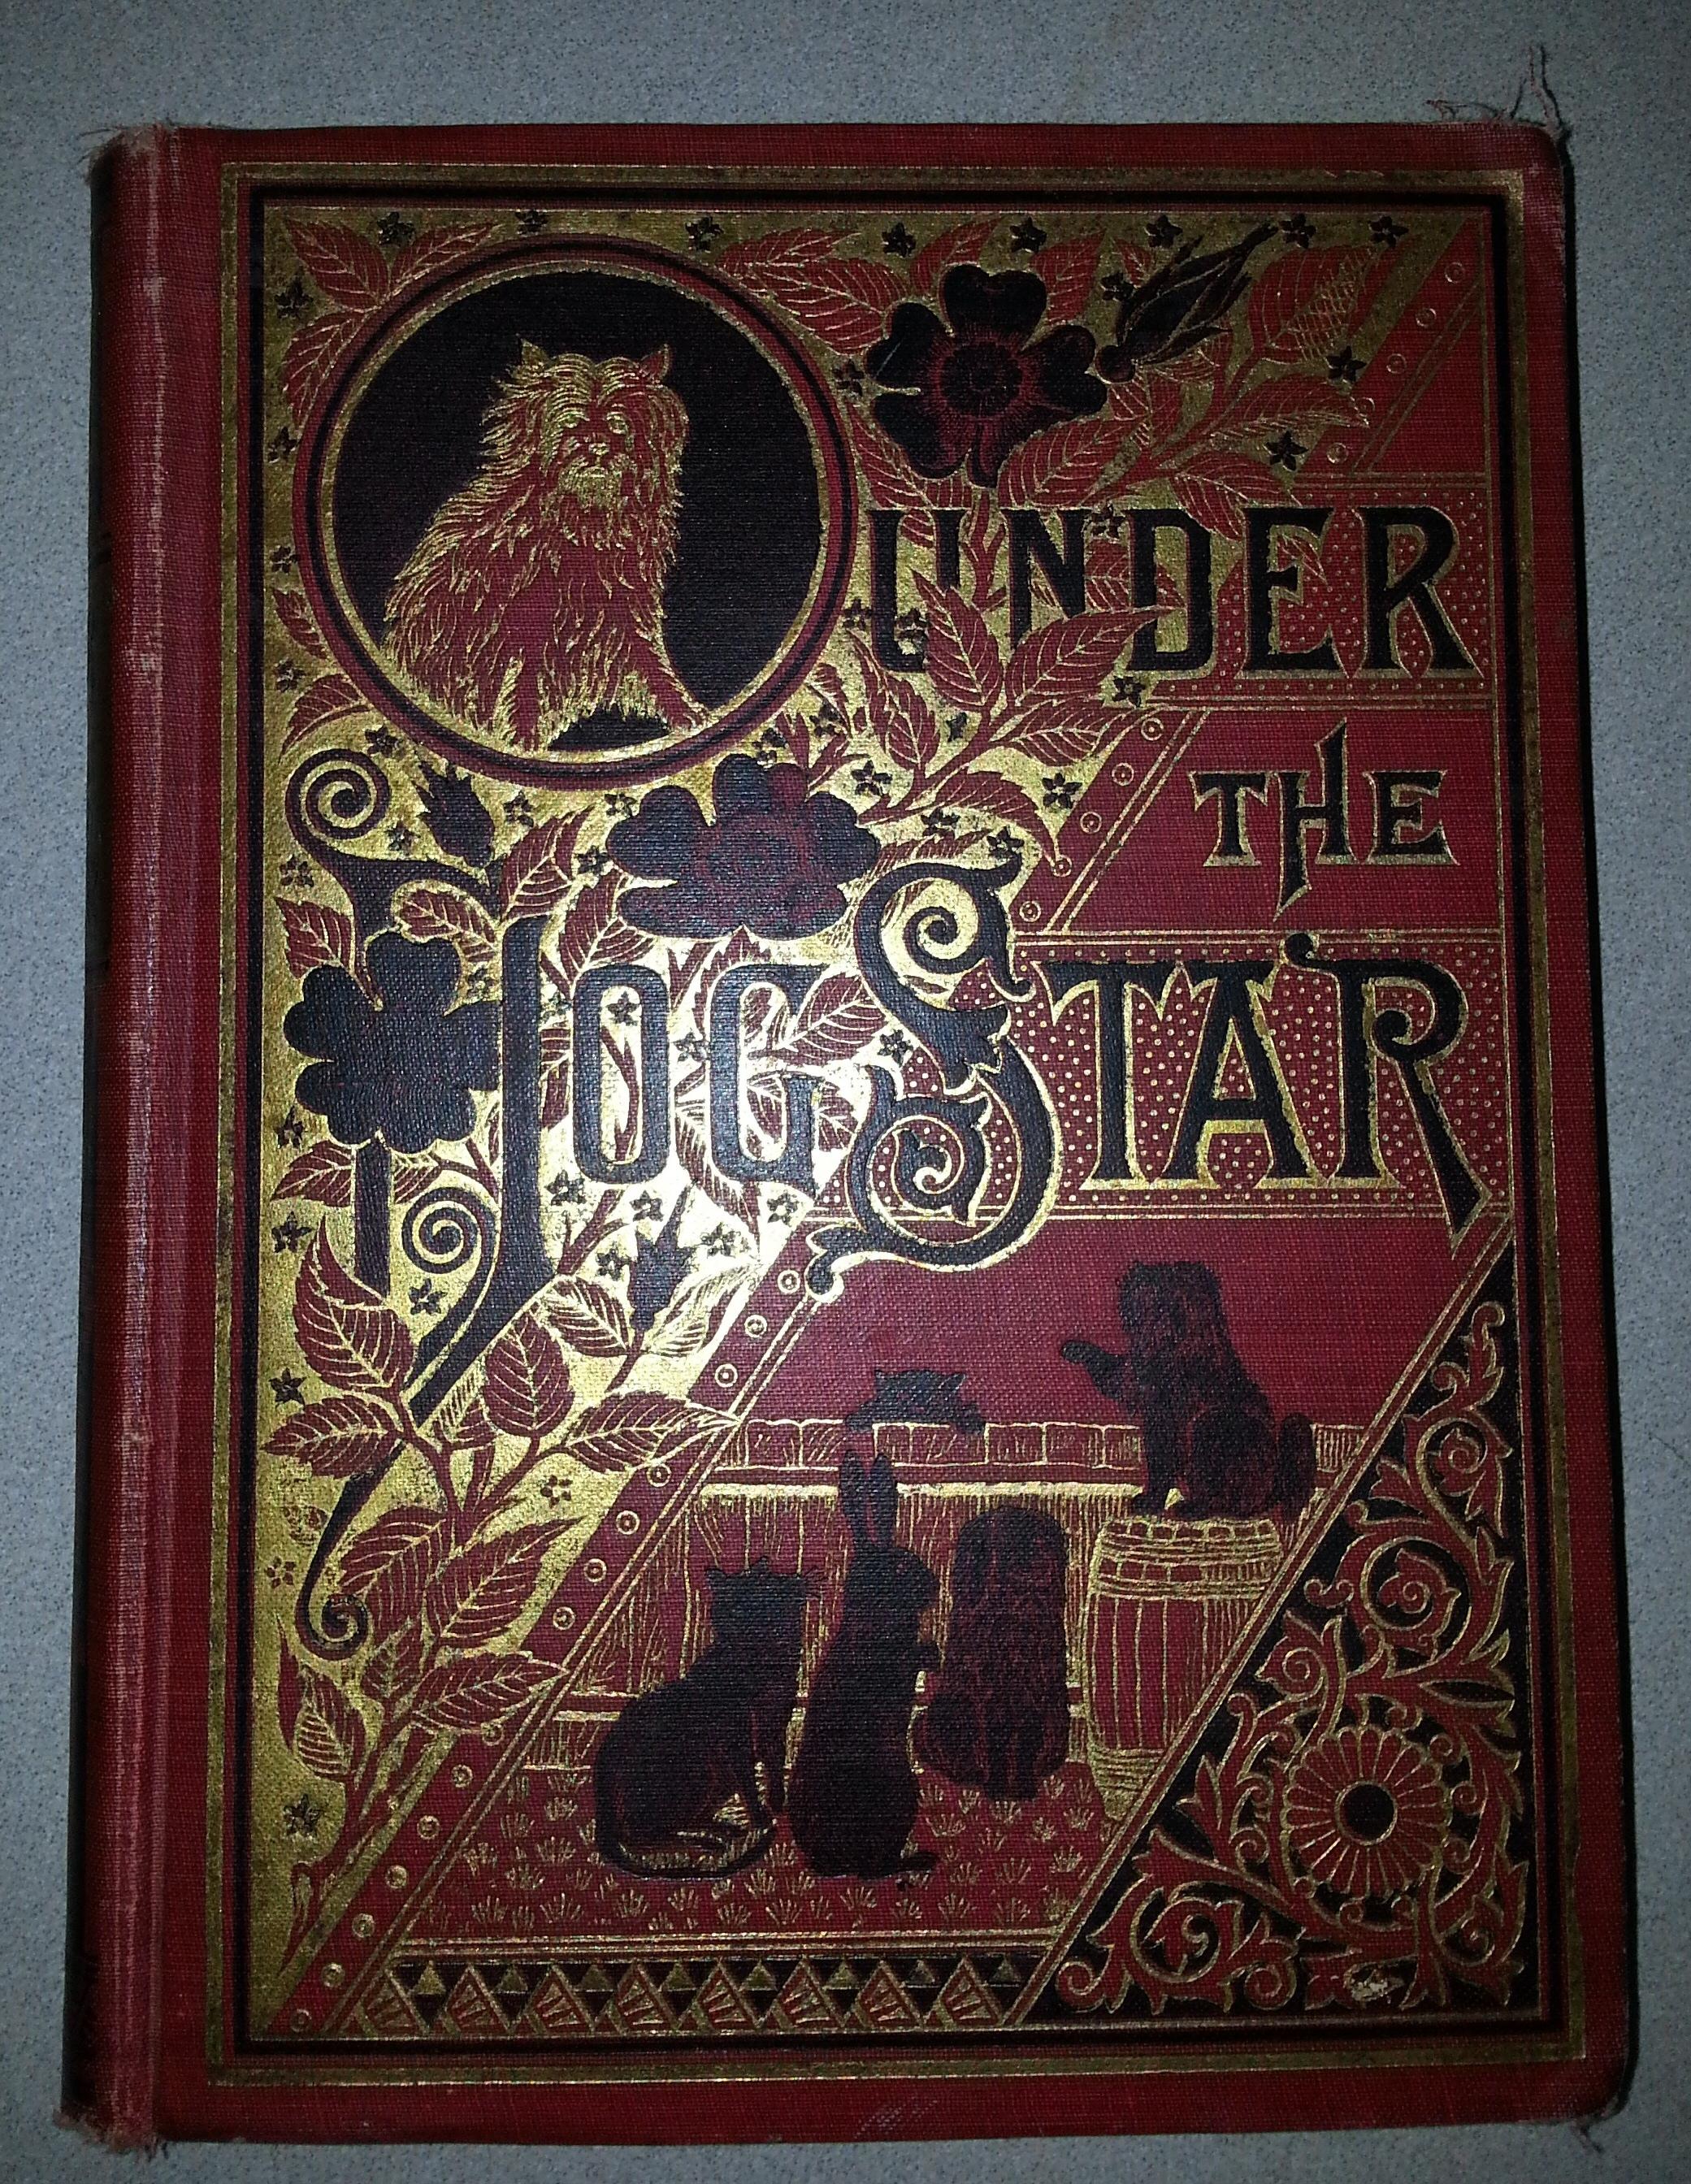 UNDER THE DOG STAR;  From the Dog Latin of Jock, Vandegrift, Margaret